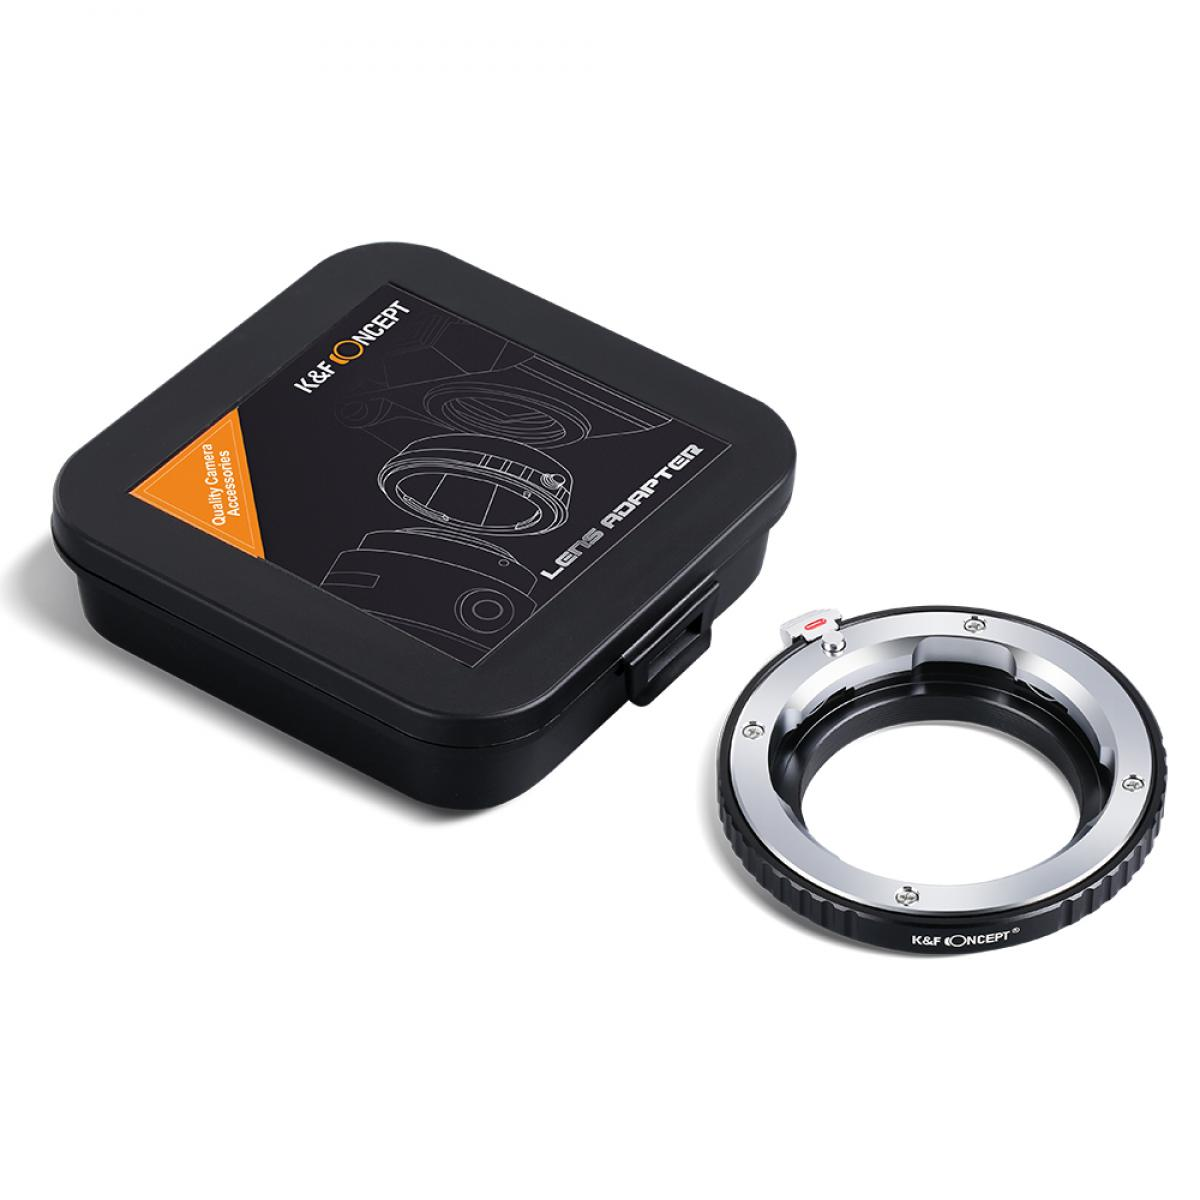 Photo Plus C Mount Lens Adapter for Olympus OM-D E-M5 Pen E-P5 E-P3 E-P2 E-P1 E-PM2 E-PM1 E-PL6 E-PL5 E-PL3 E-PL2 E-PL1s E-PL1